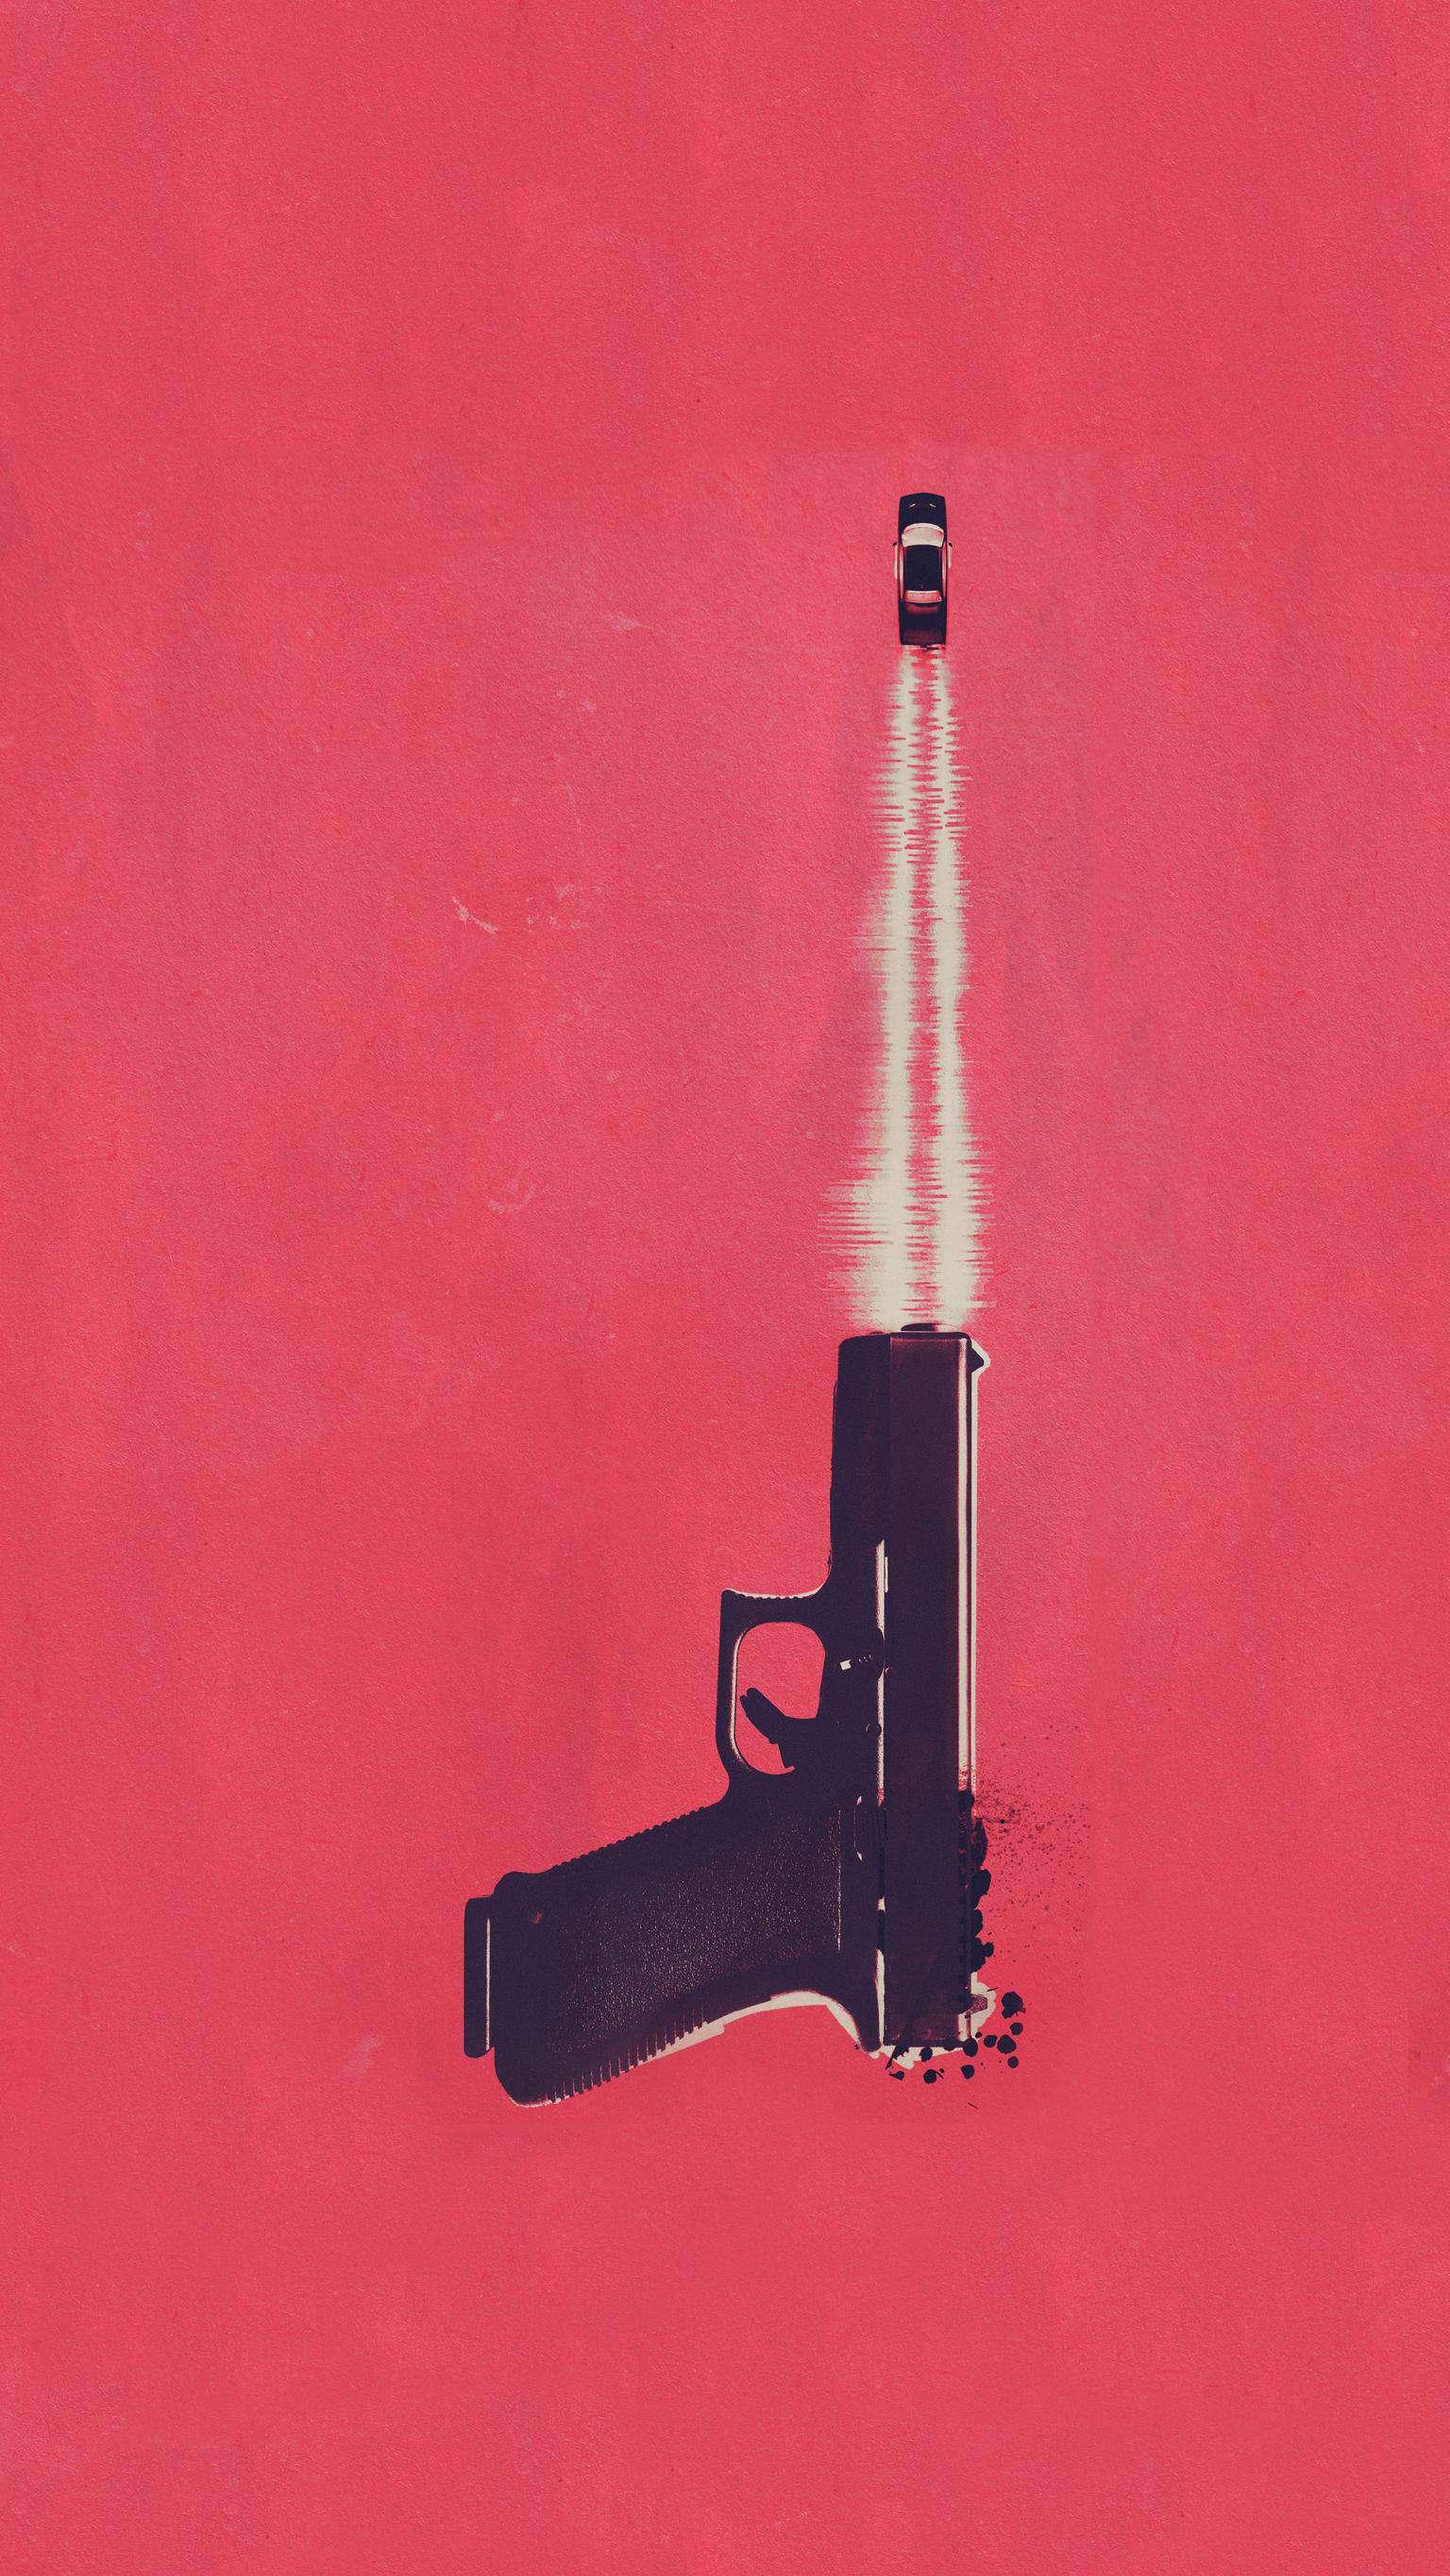 Minimal Gun iPhone Wallpaper